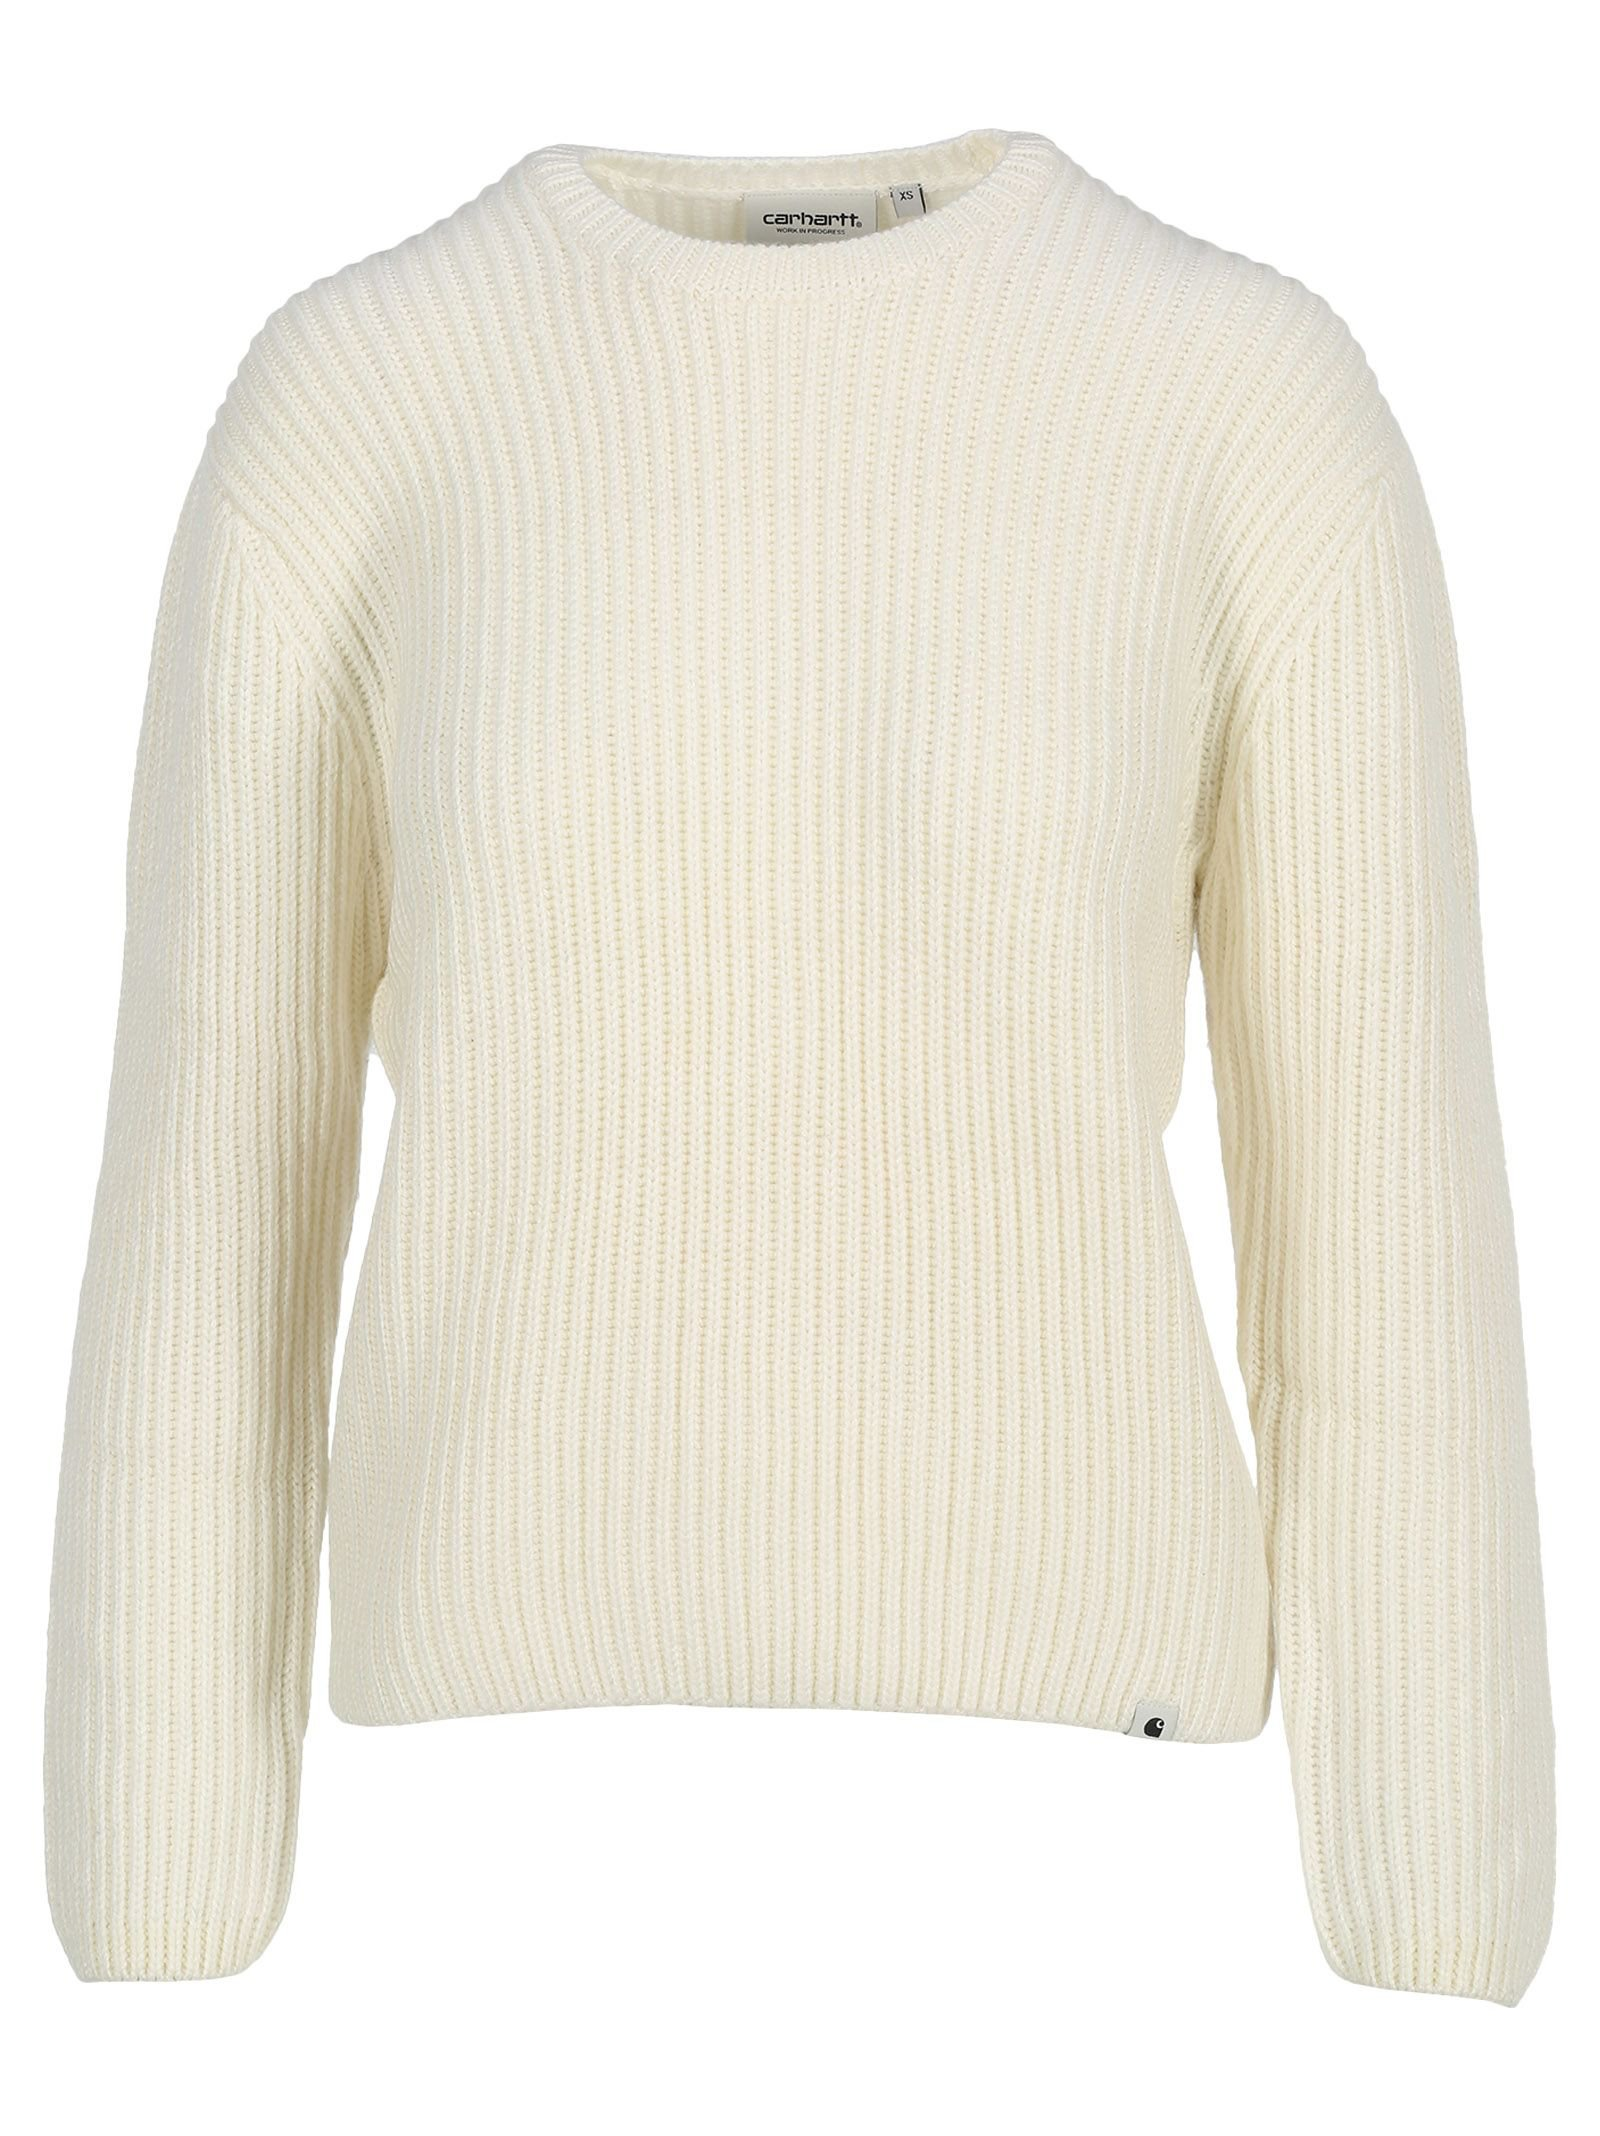 Carhartt Carhartt Kaleva Sweater